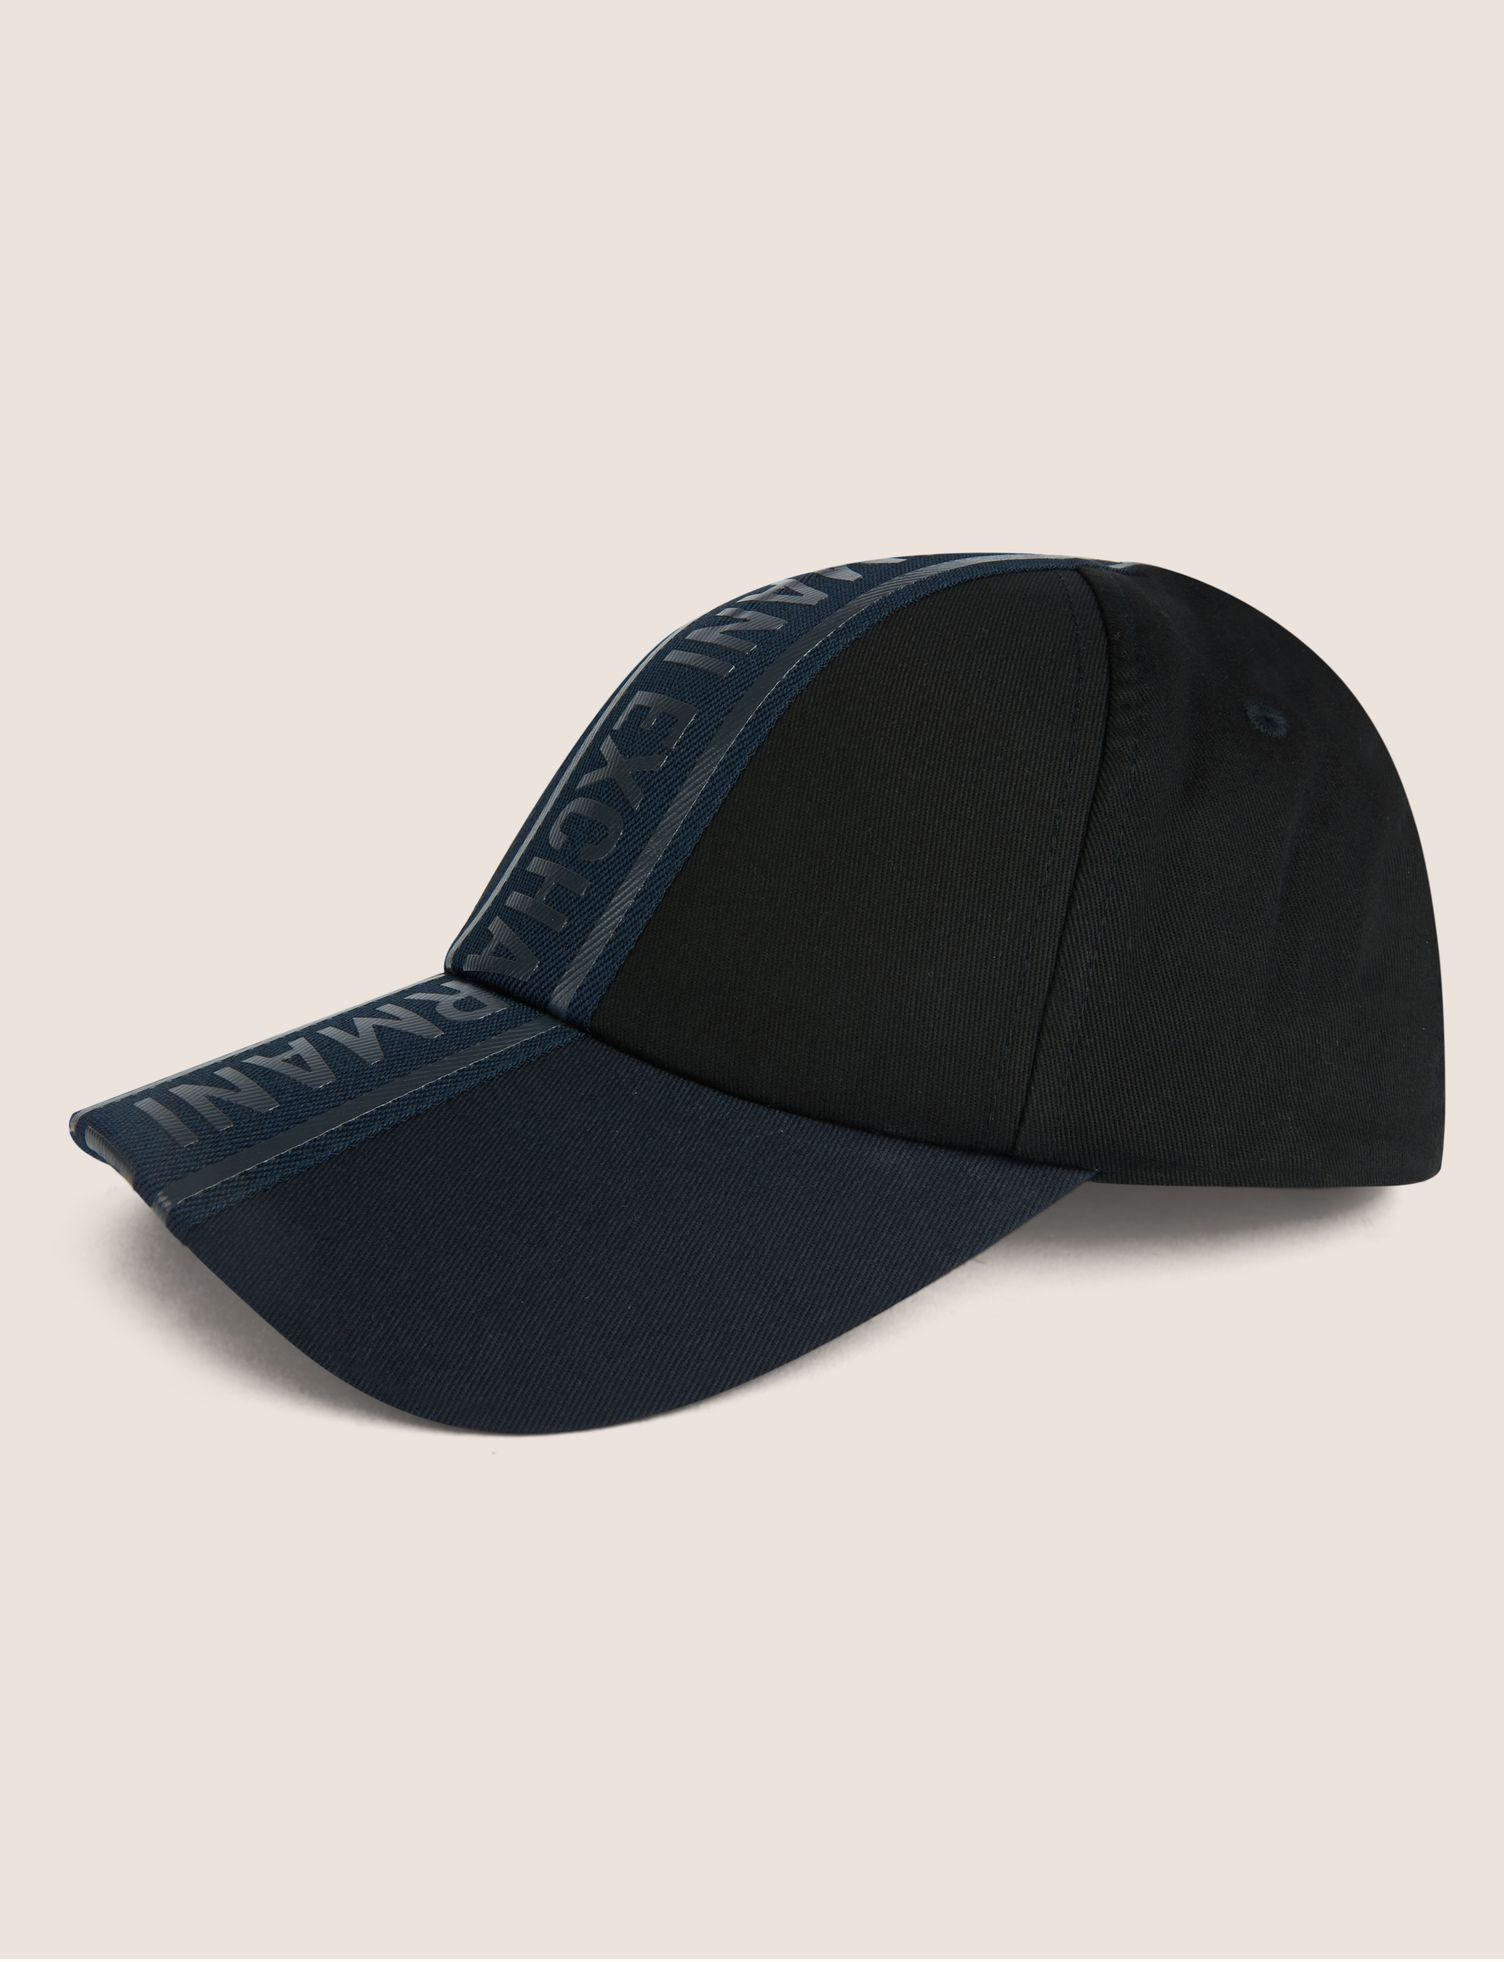 1ebf44d2f05 Lyst - Armani Exchange High-shine Logo Tape Hat in Black for Men